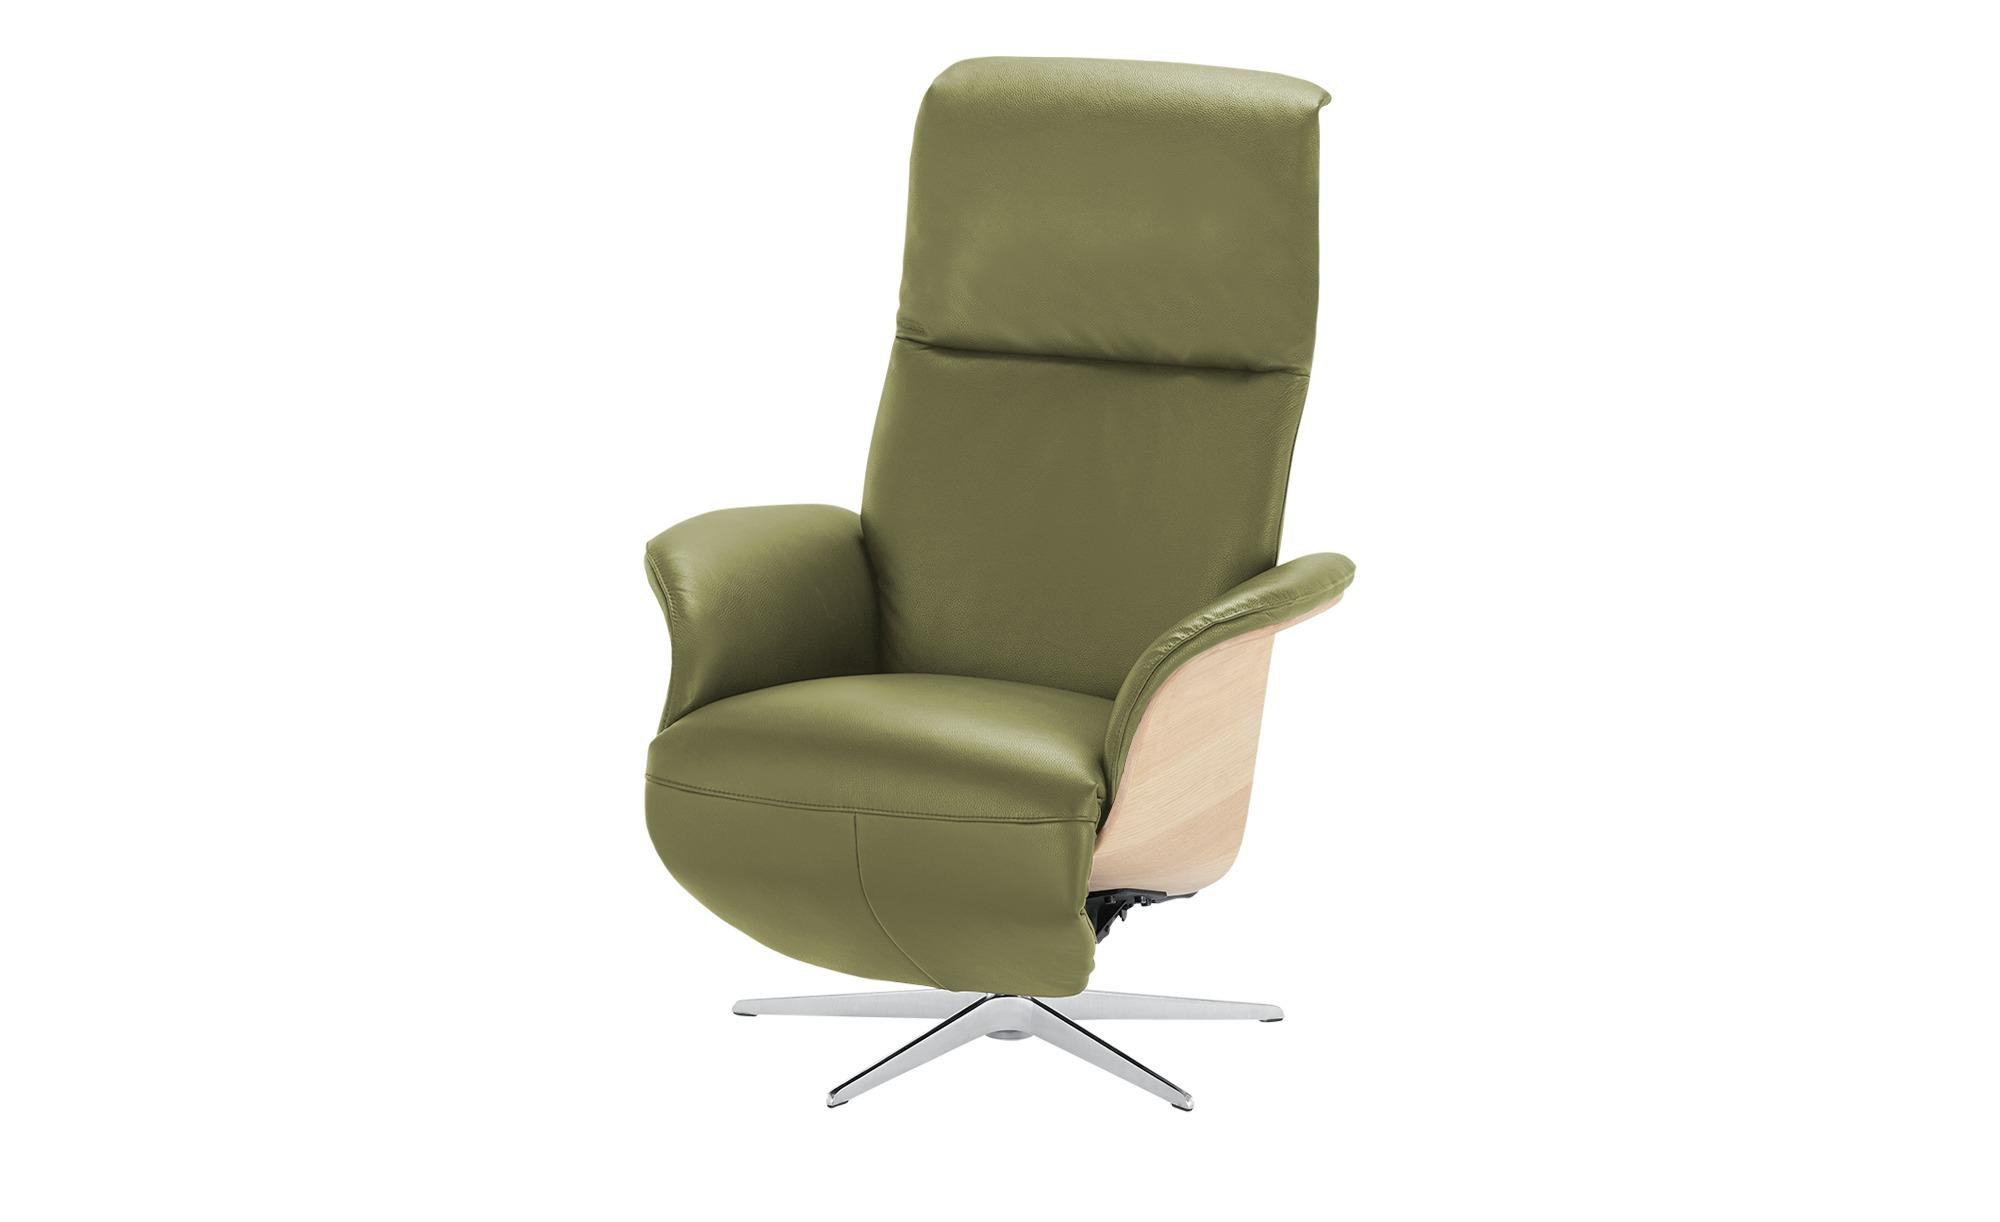 Nils Olsen Relaxsessel  Frederik ¦ grün ¦ Maße (cm): B: 78 H: 113 T: 79 Polstermöbel > Sessel > Fernsehsessel - Höffner